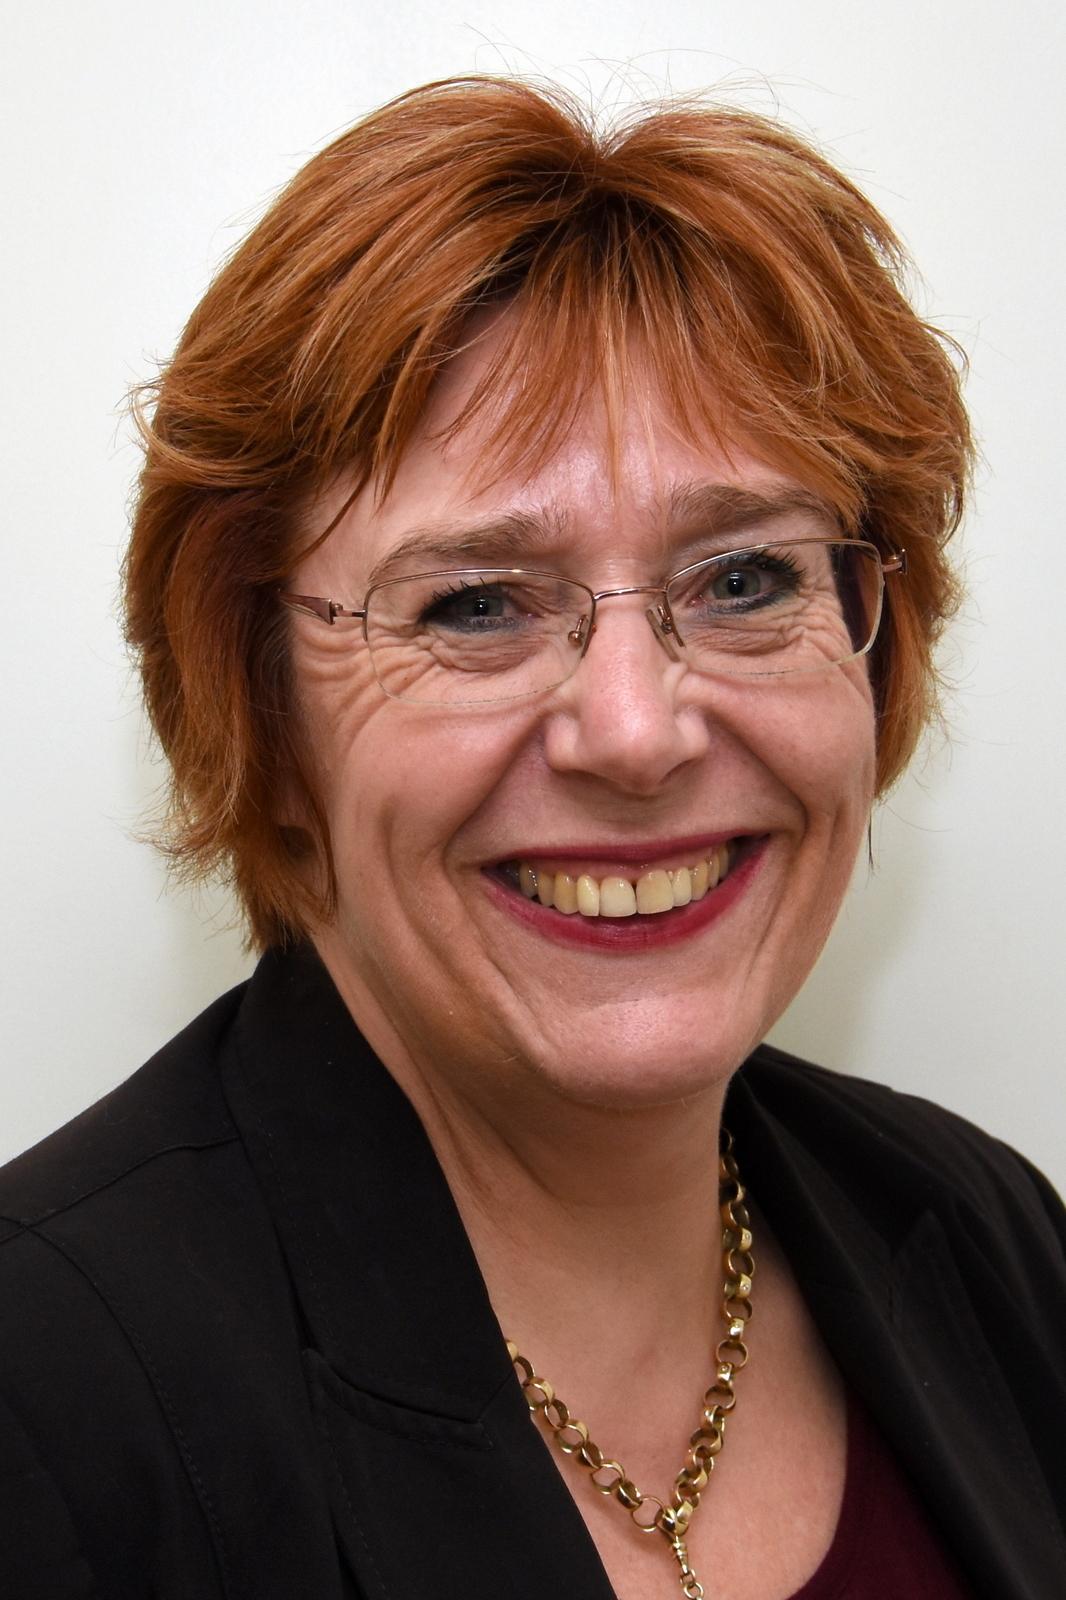 Treasurer - Sheree Osborne